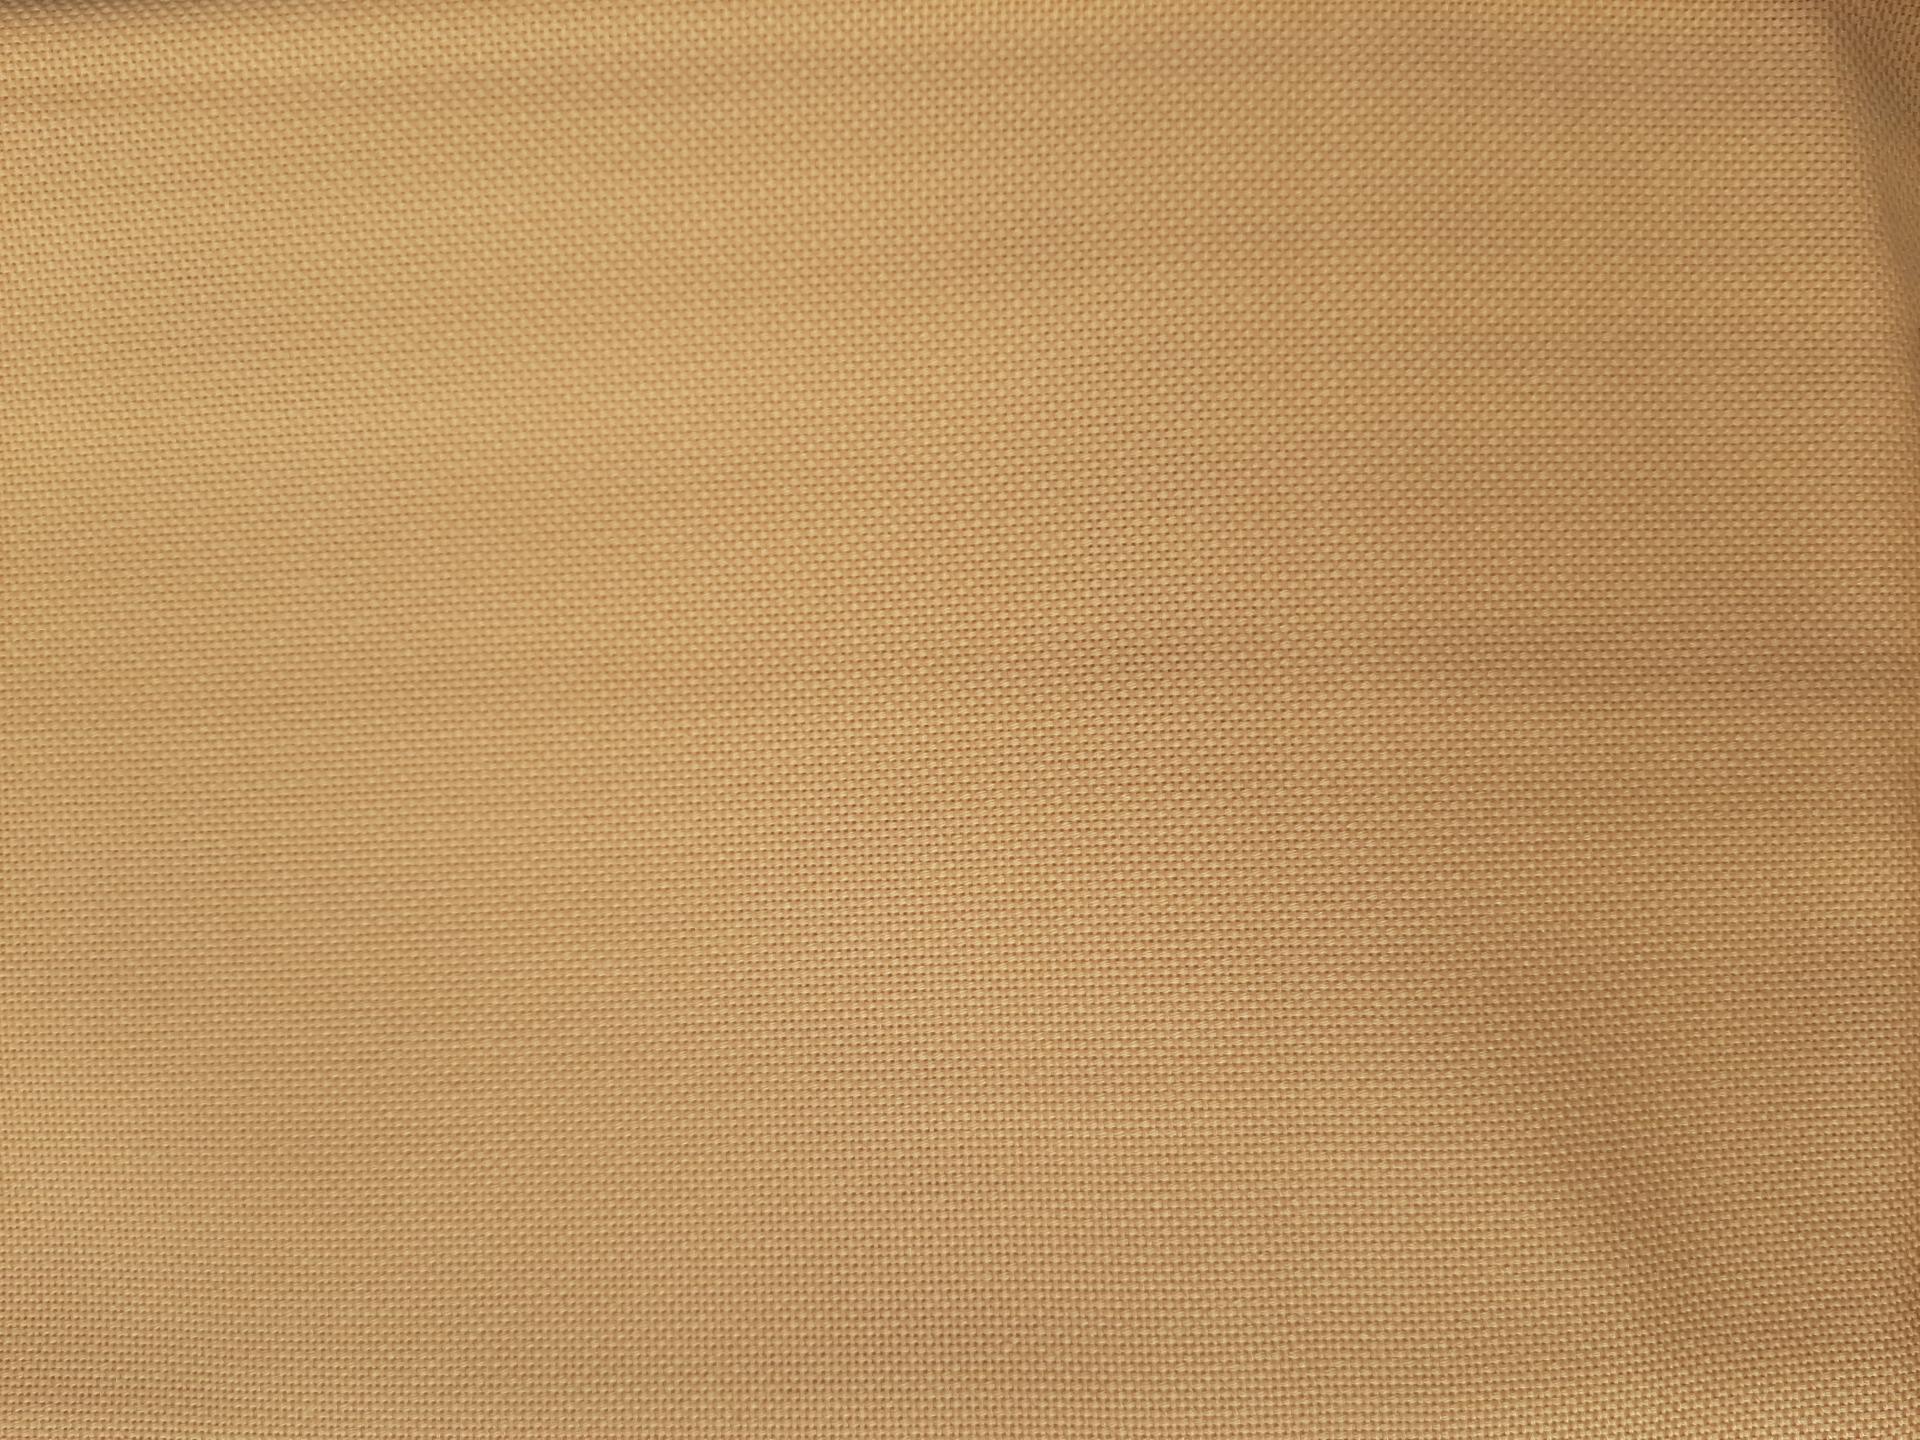 Toile a broder hofer murano 403 etamine 10 fils vanille 241 b